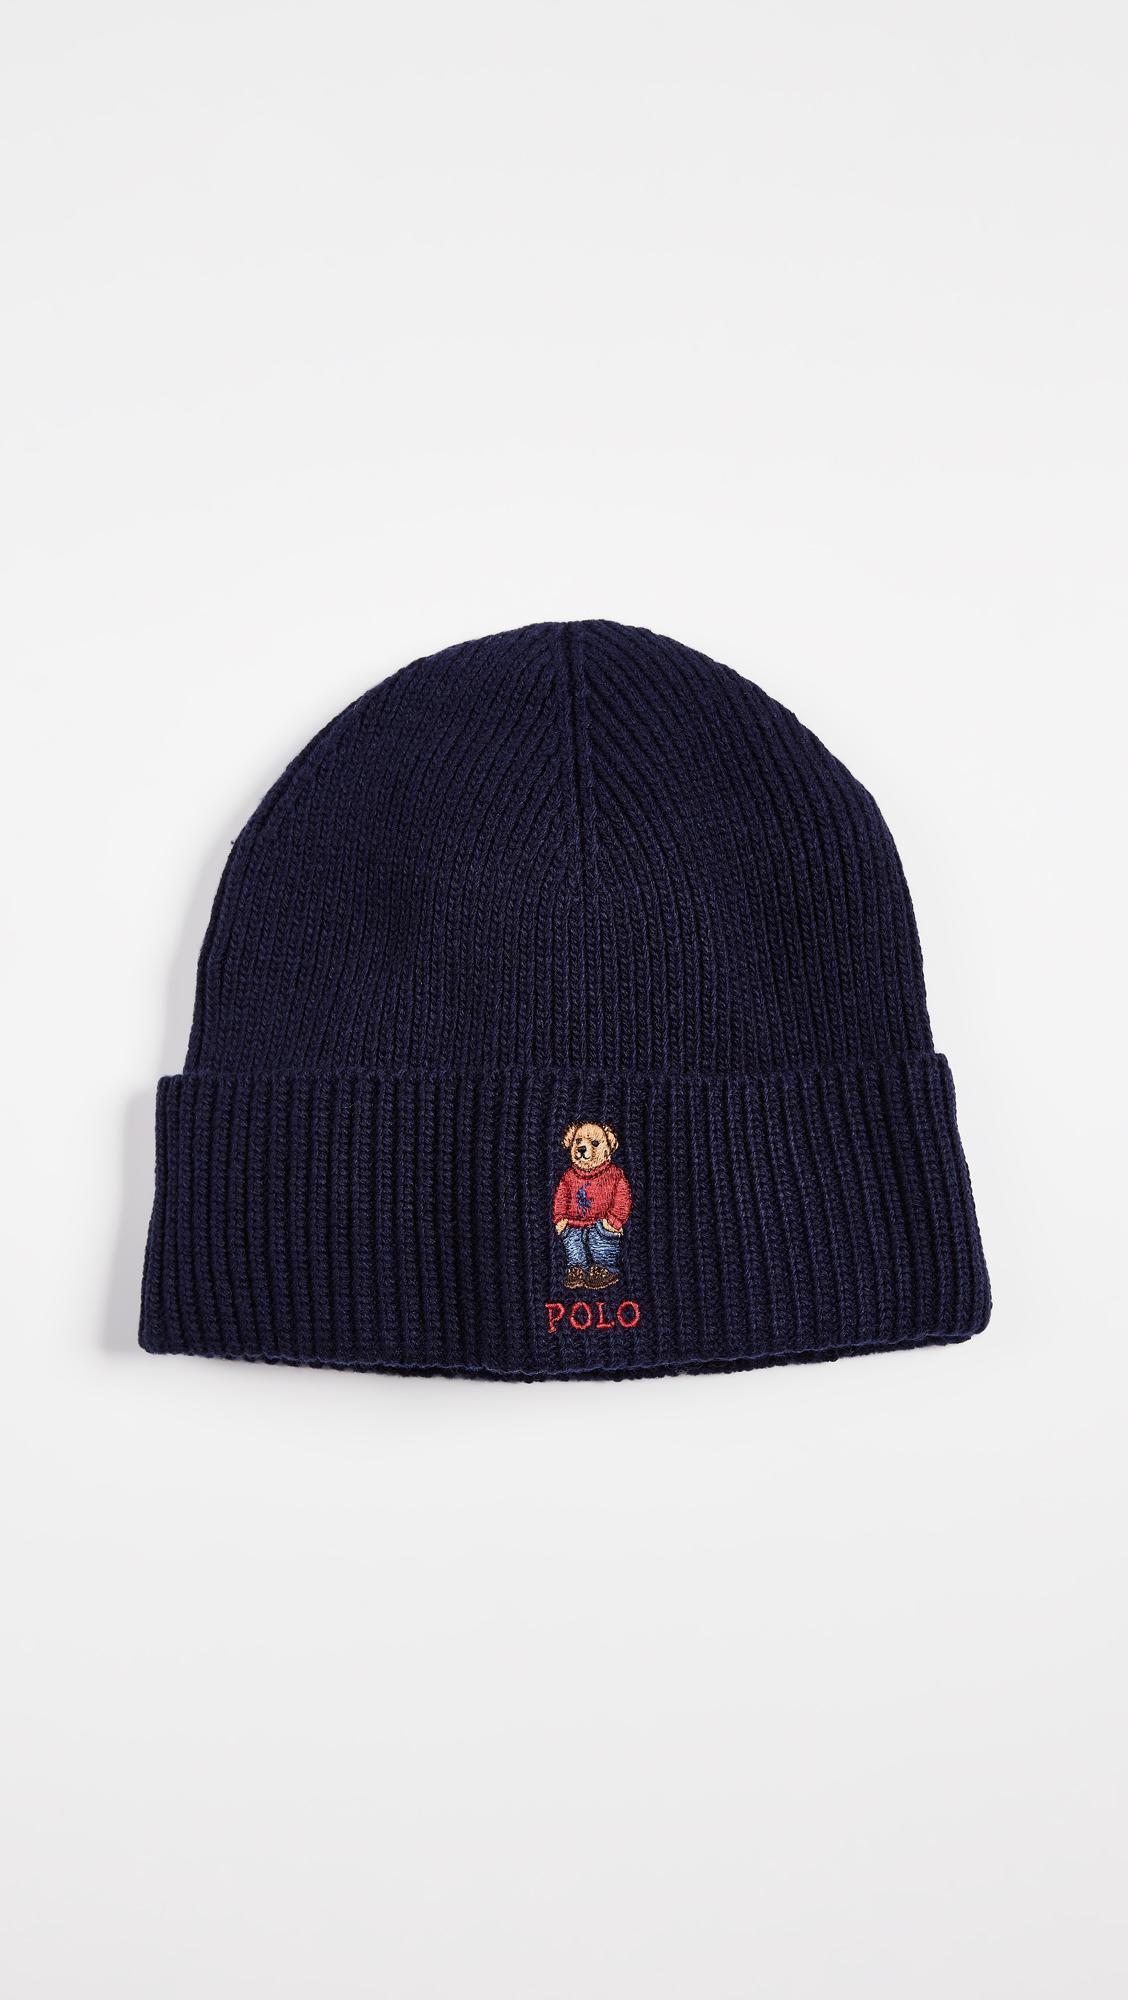 Polo Ralph Lauren Polo Pony Bear Hat in Blue for Men - Lyst fe19a7dc9ac8